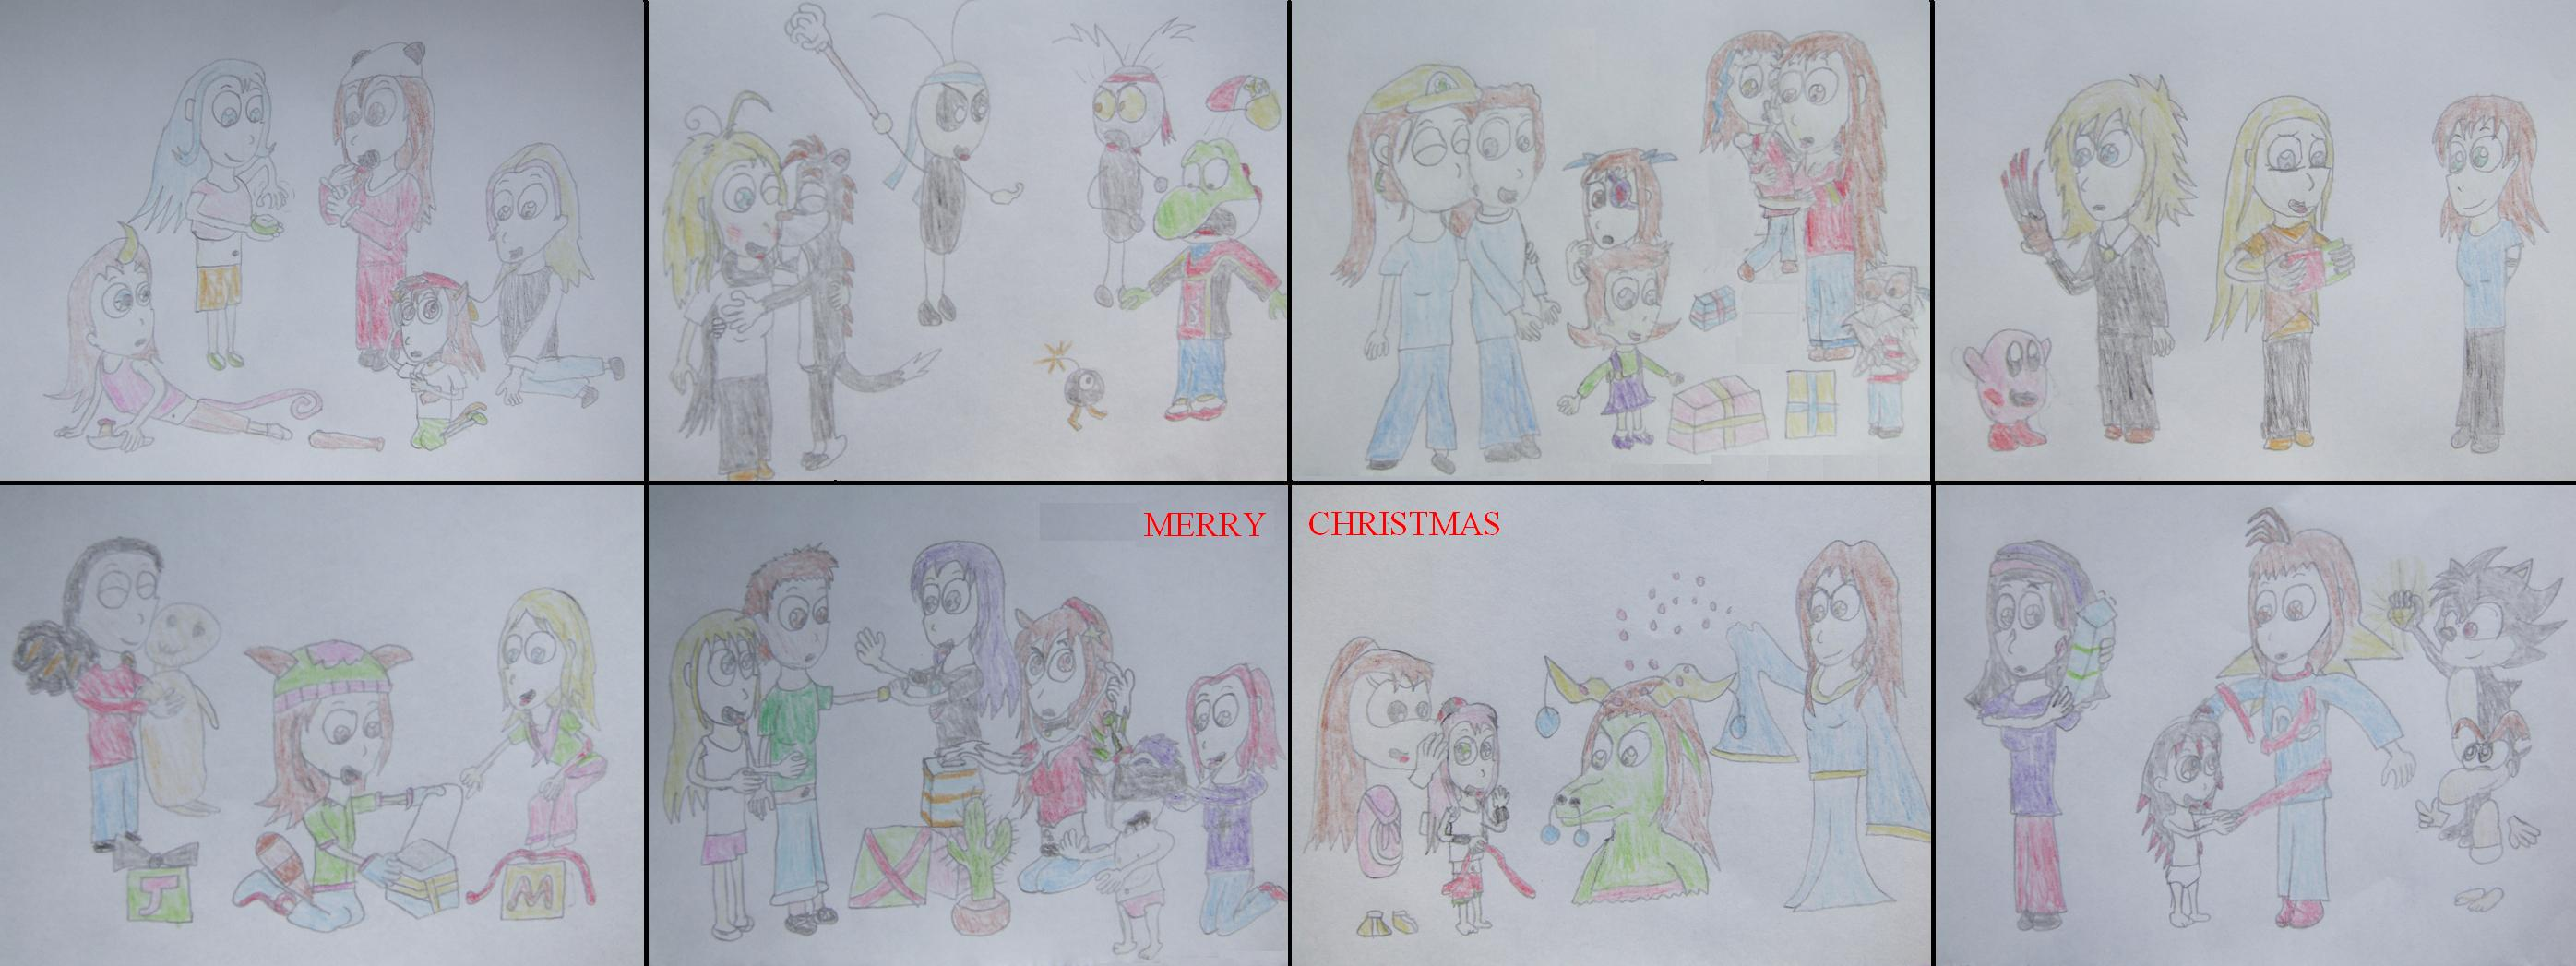 CB Buddy Christmas Fun by Crash-the-Megaraptor